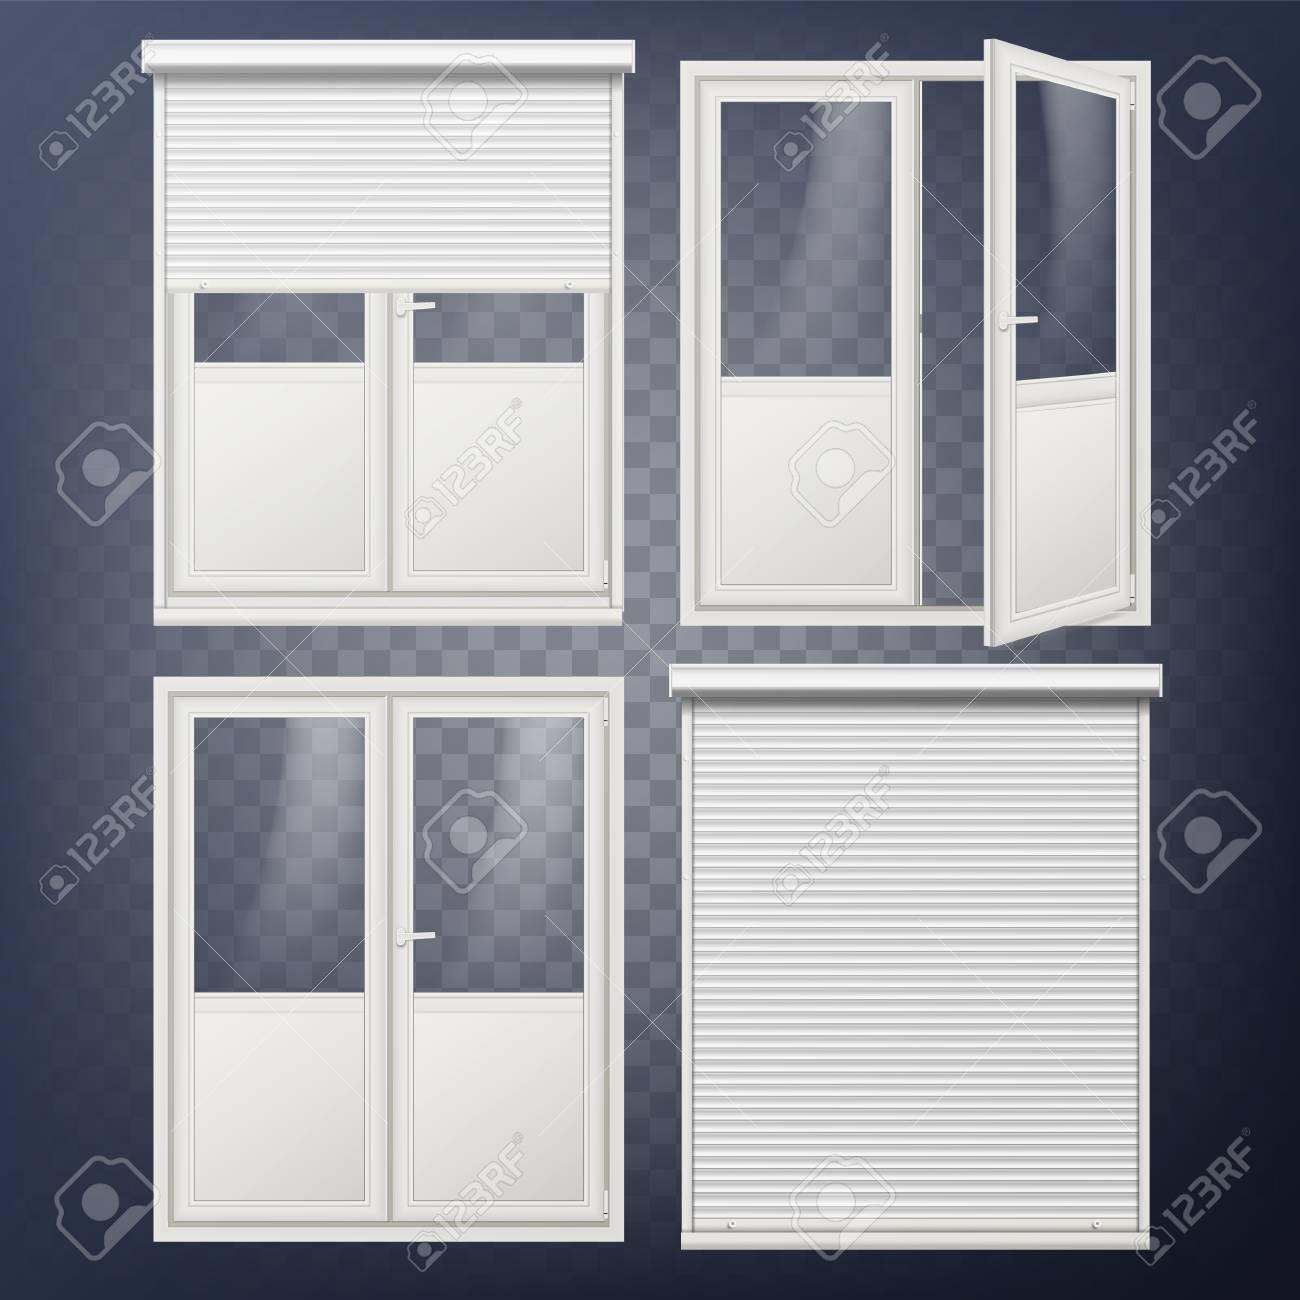 Plastic Glass Door Vector In White Roller Shutter Stock 96235436